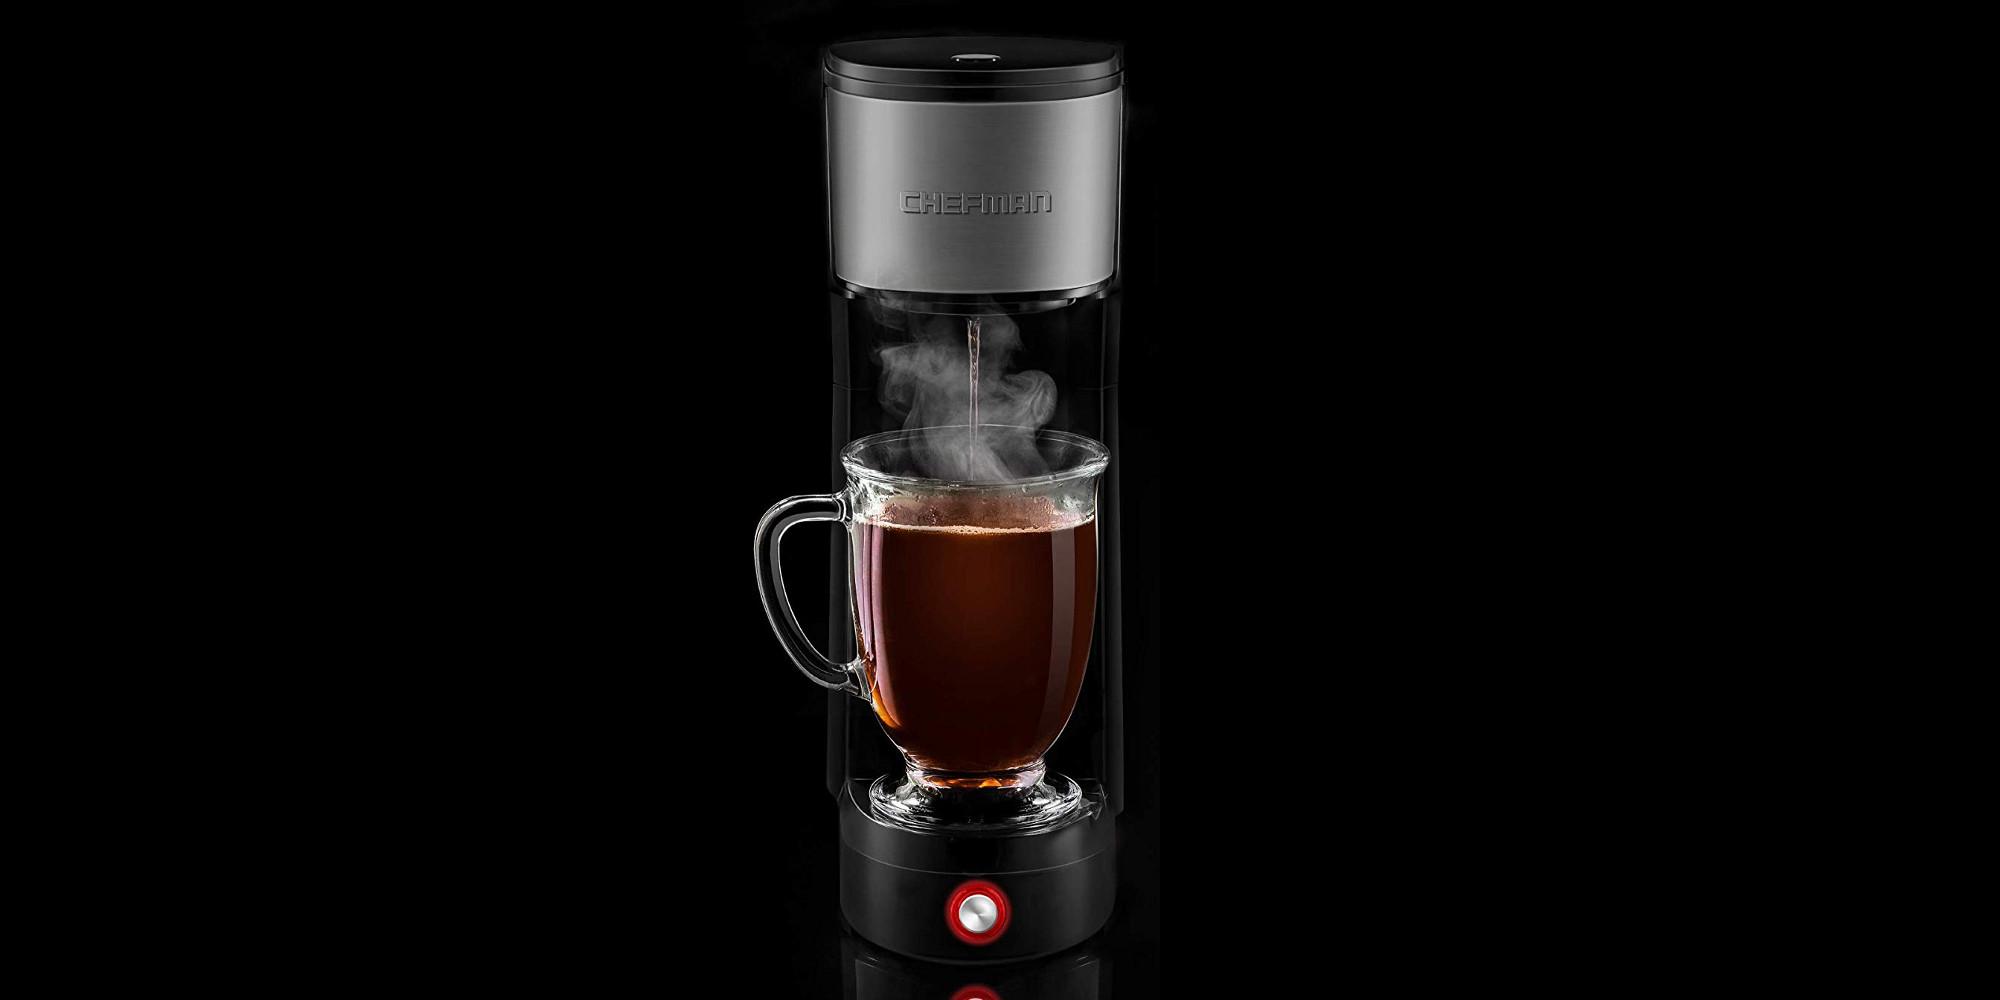 Chefman's slender single-serve coffee maker now $30 for ...